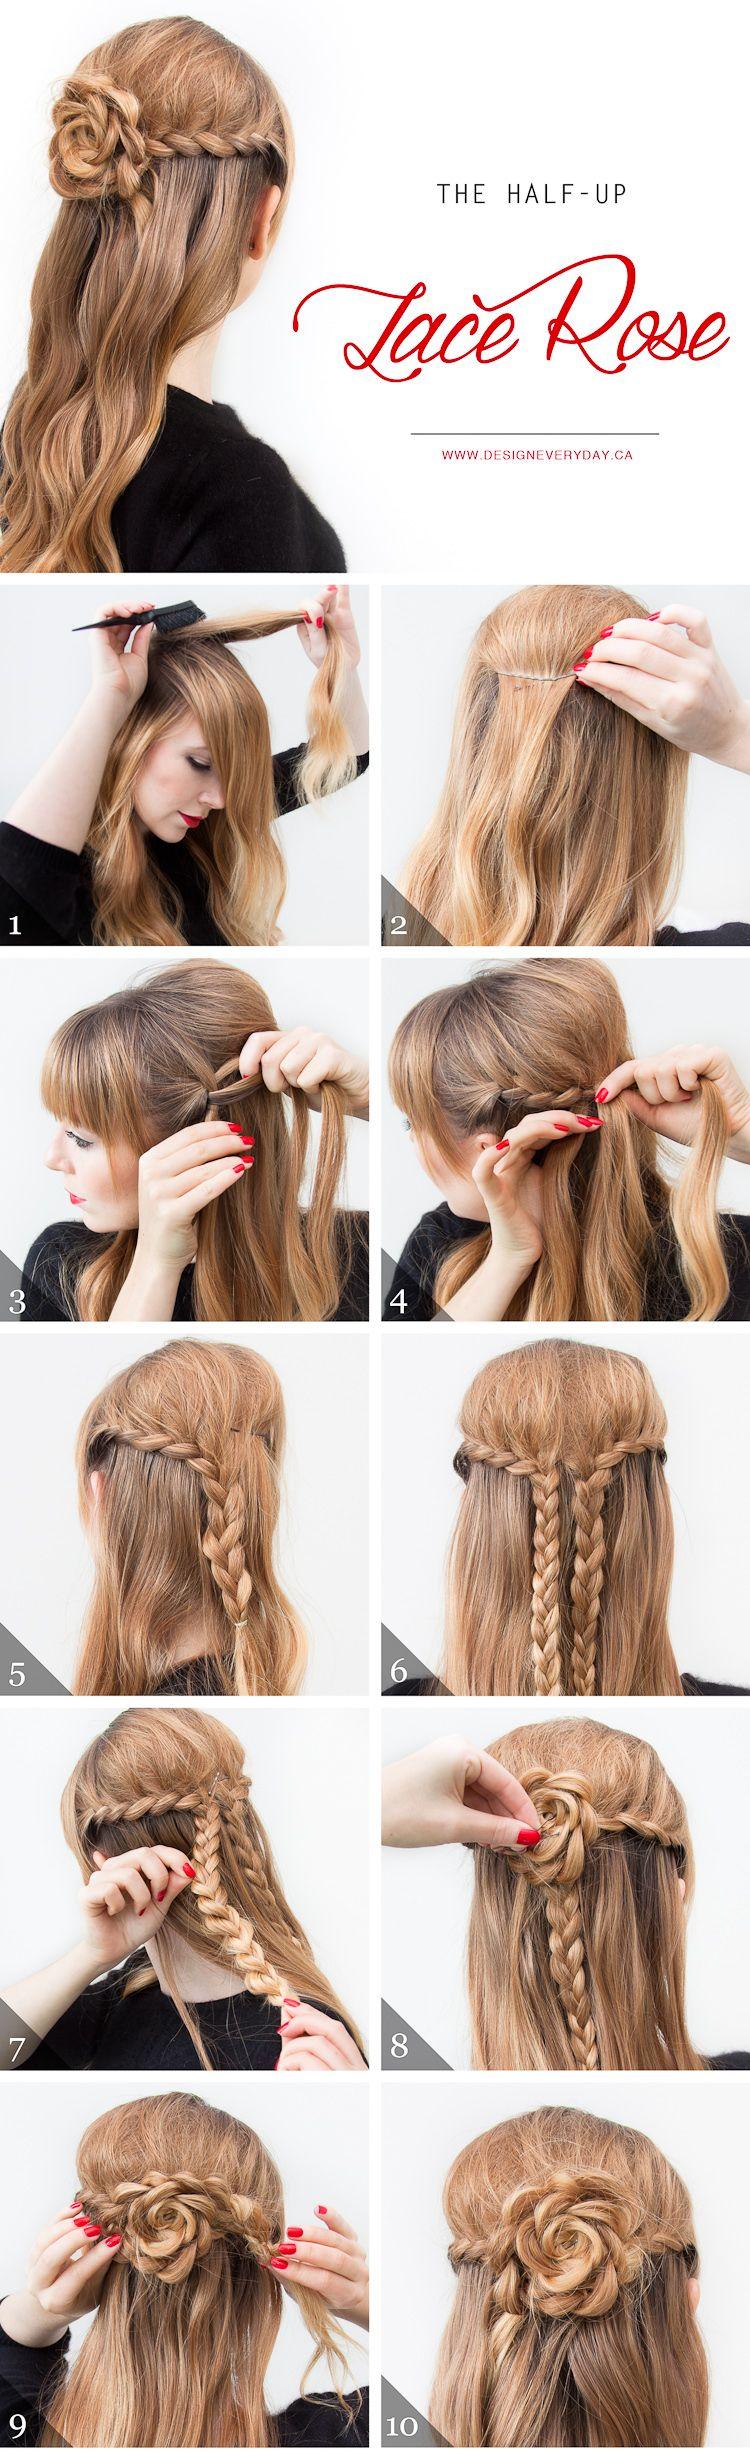 How to grow long beautiful hair u long hair growth tips lace braid